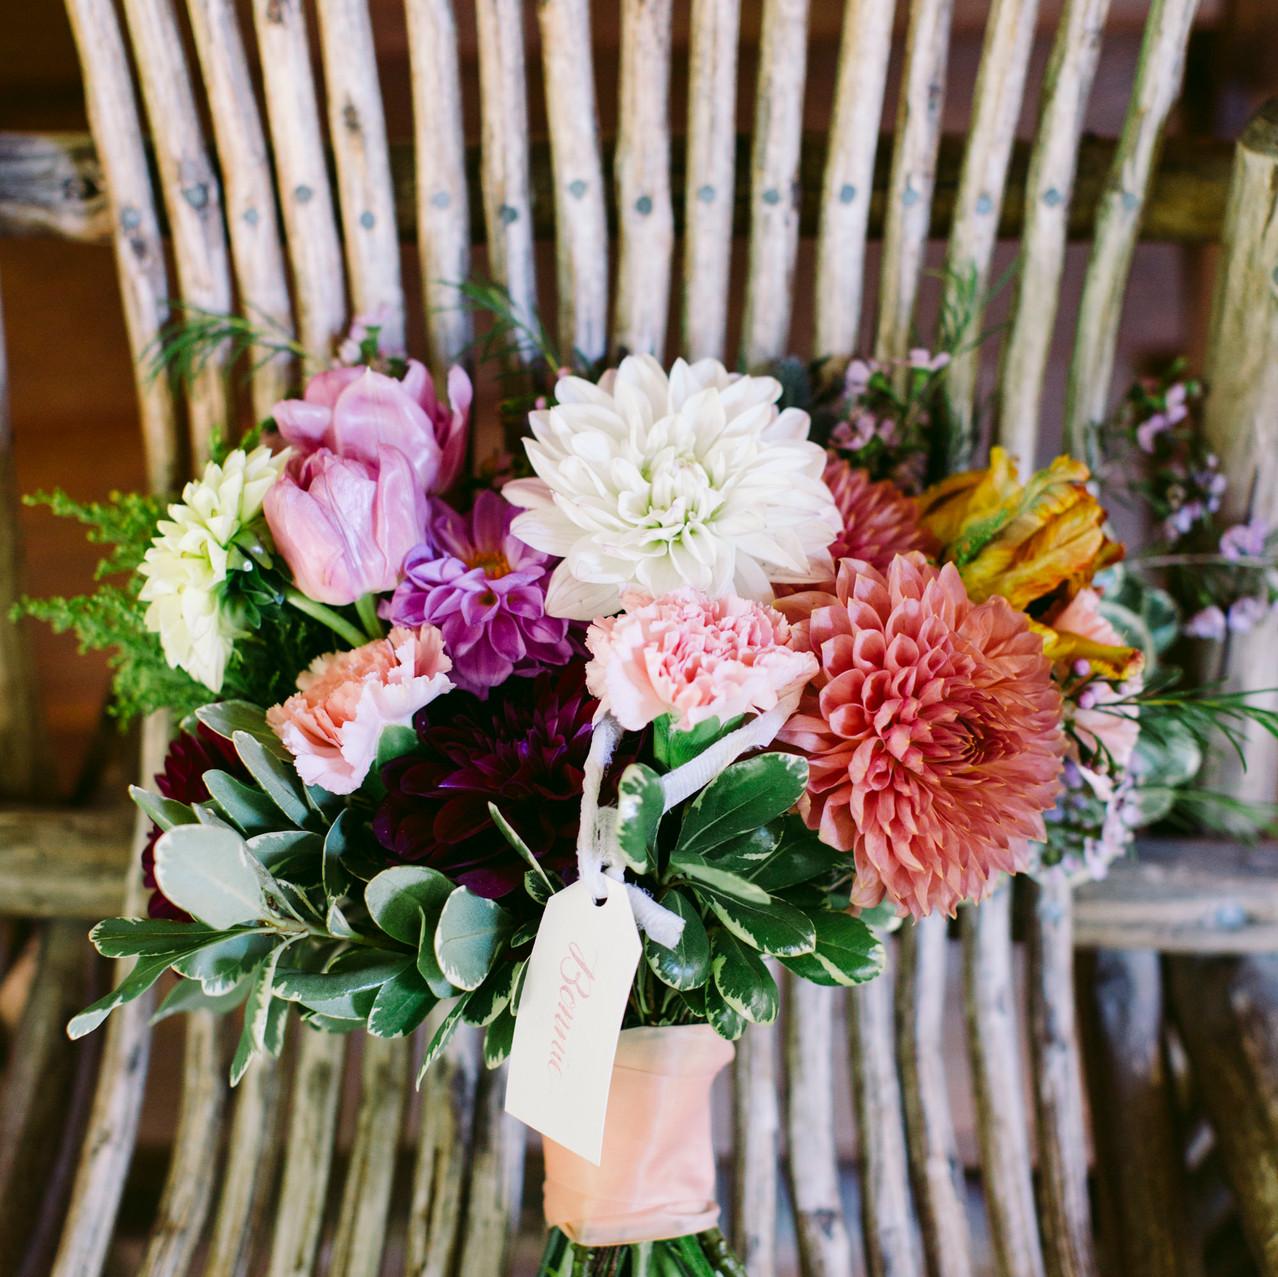 Sherbet-Colored Bouquet